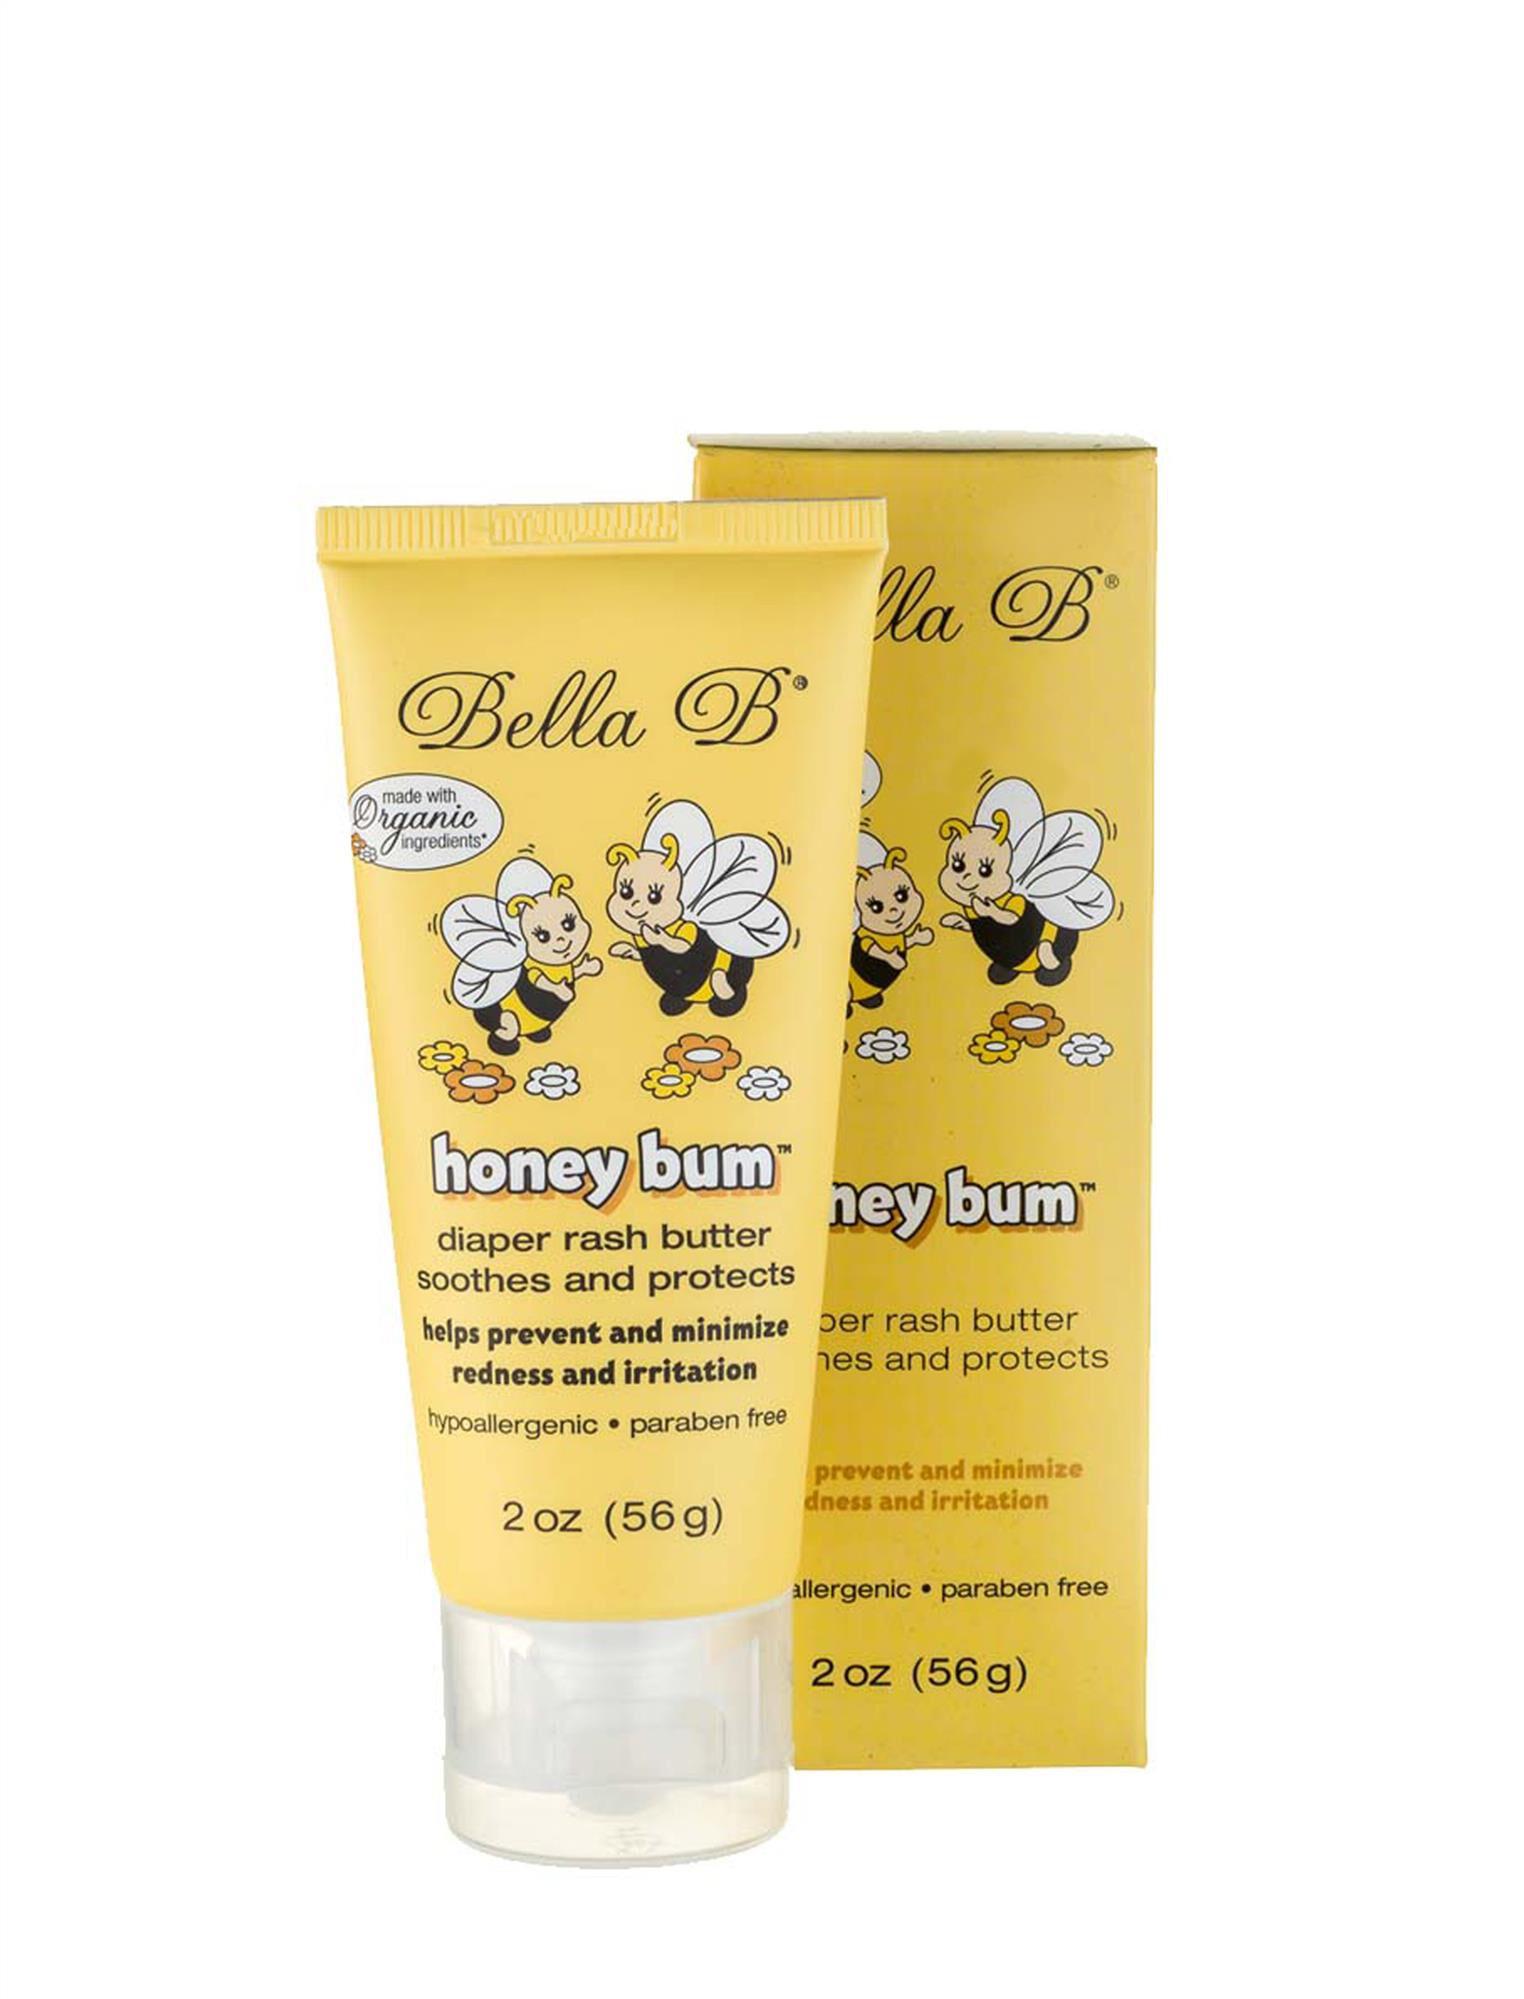 Bella B Honey Bum Diaper Rash Butter